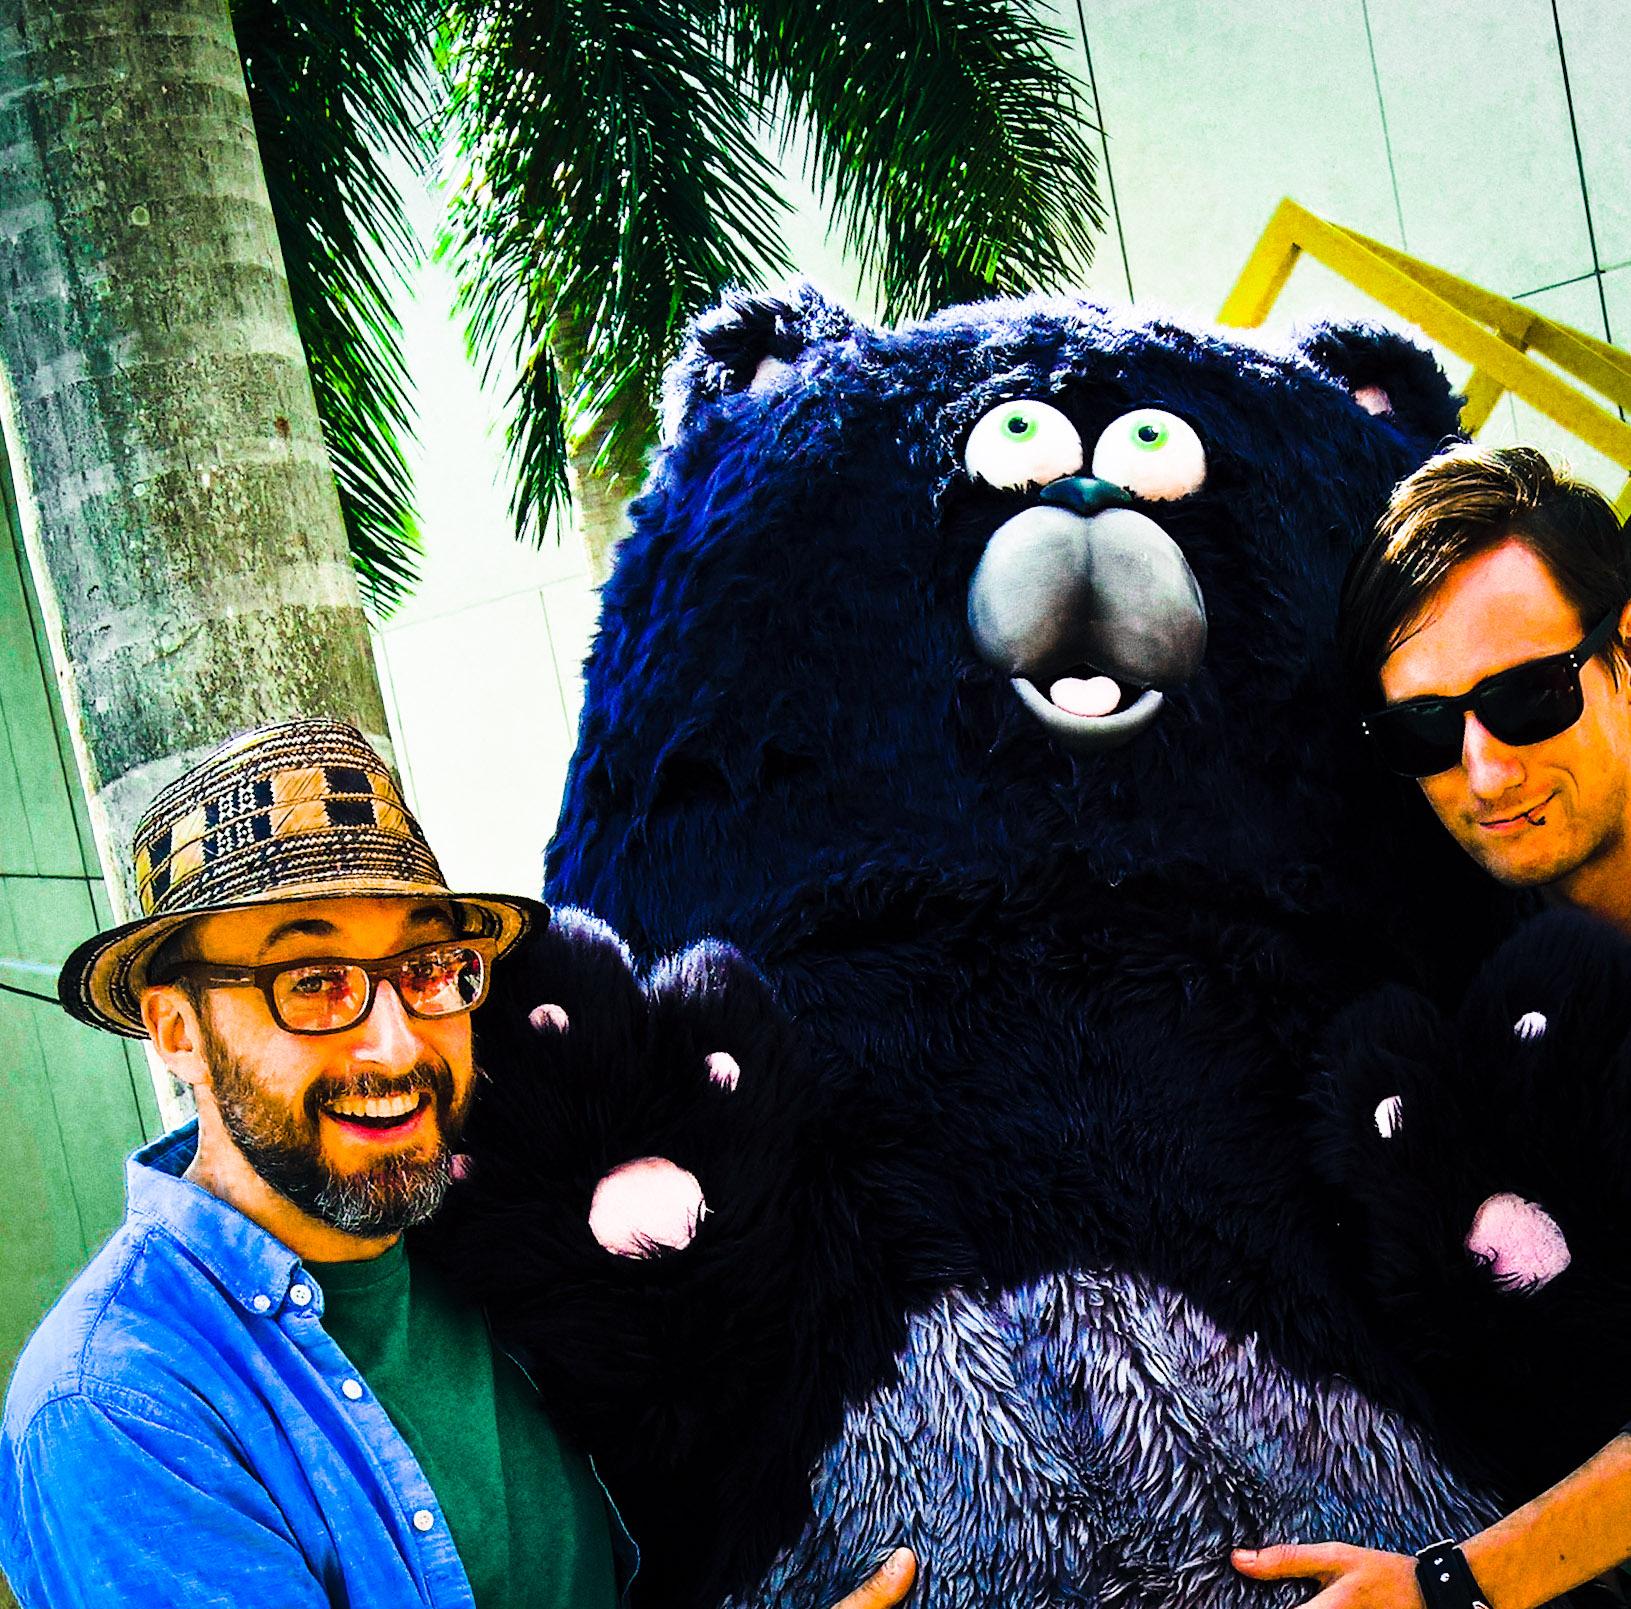 Ted + Dillon at Miami Book Fair, 2016